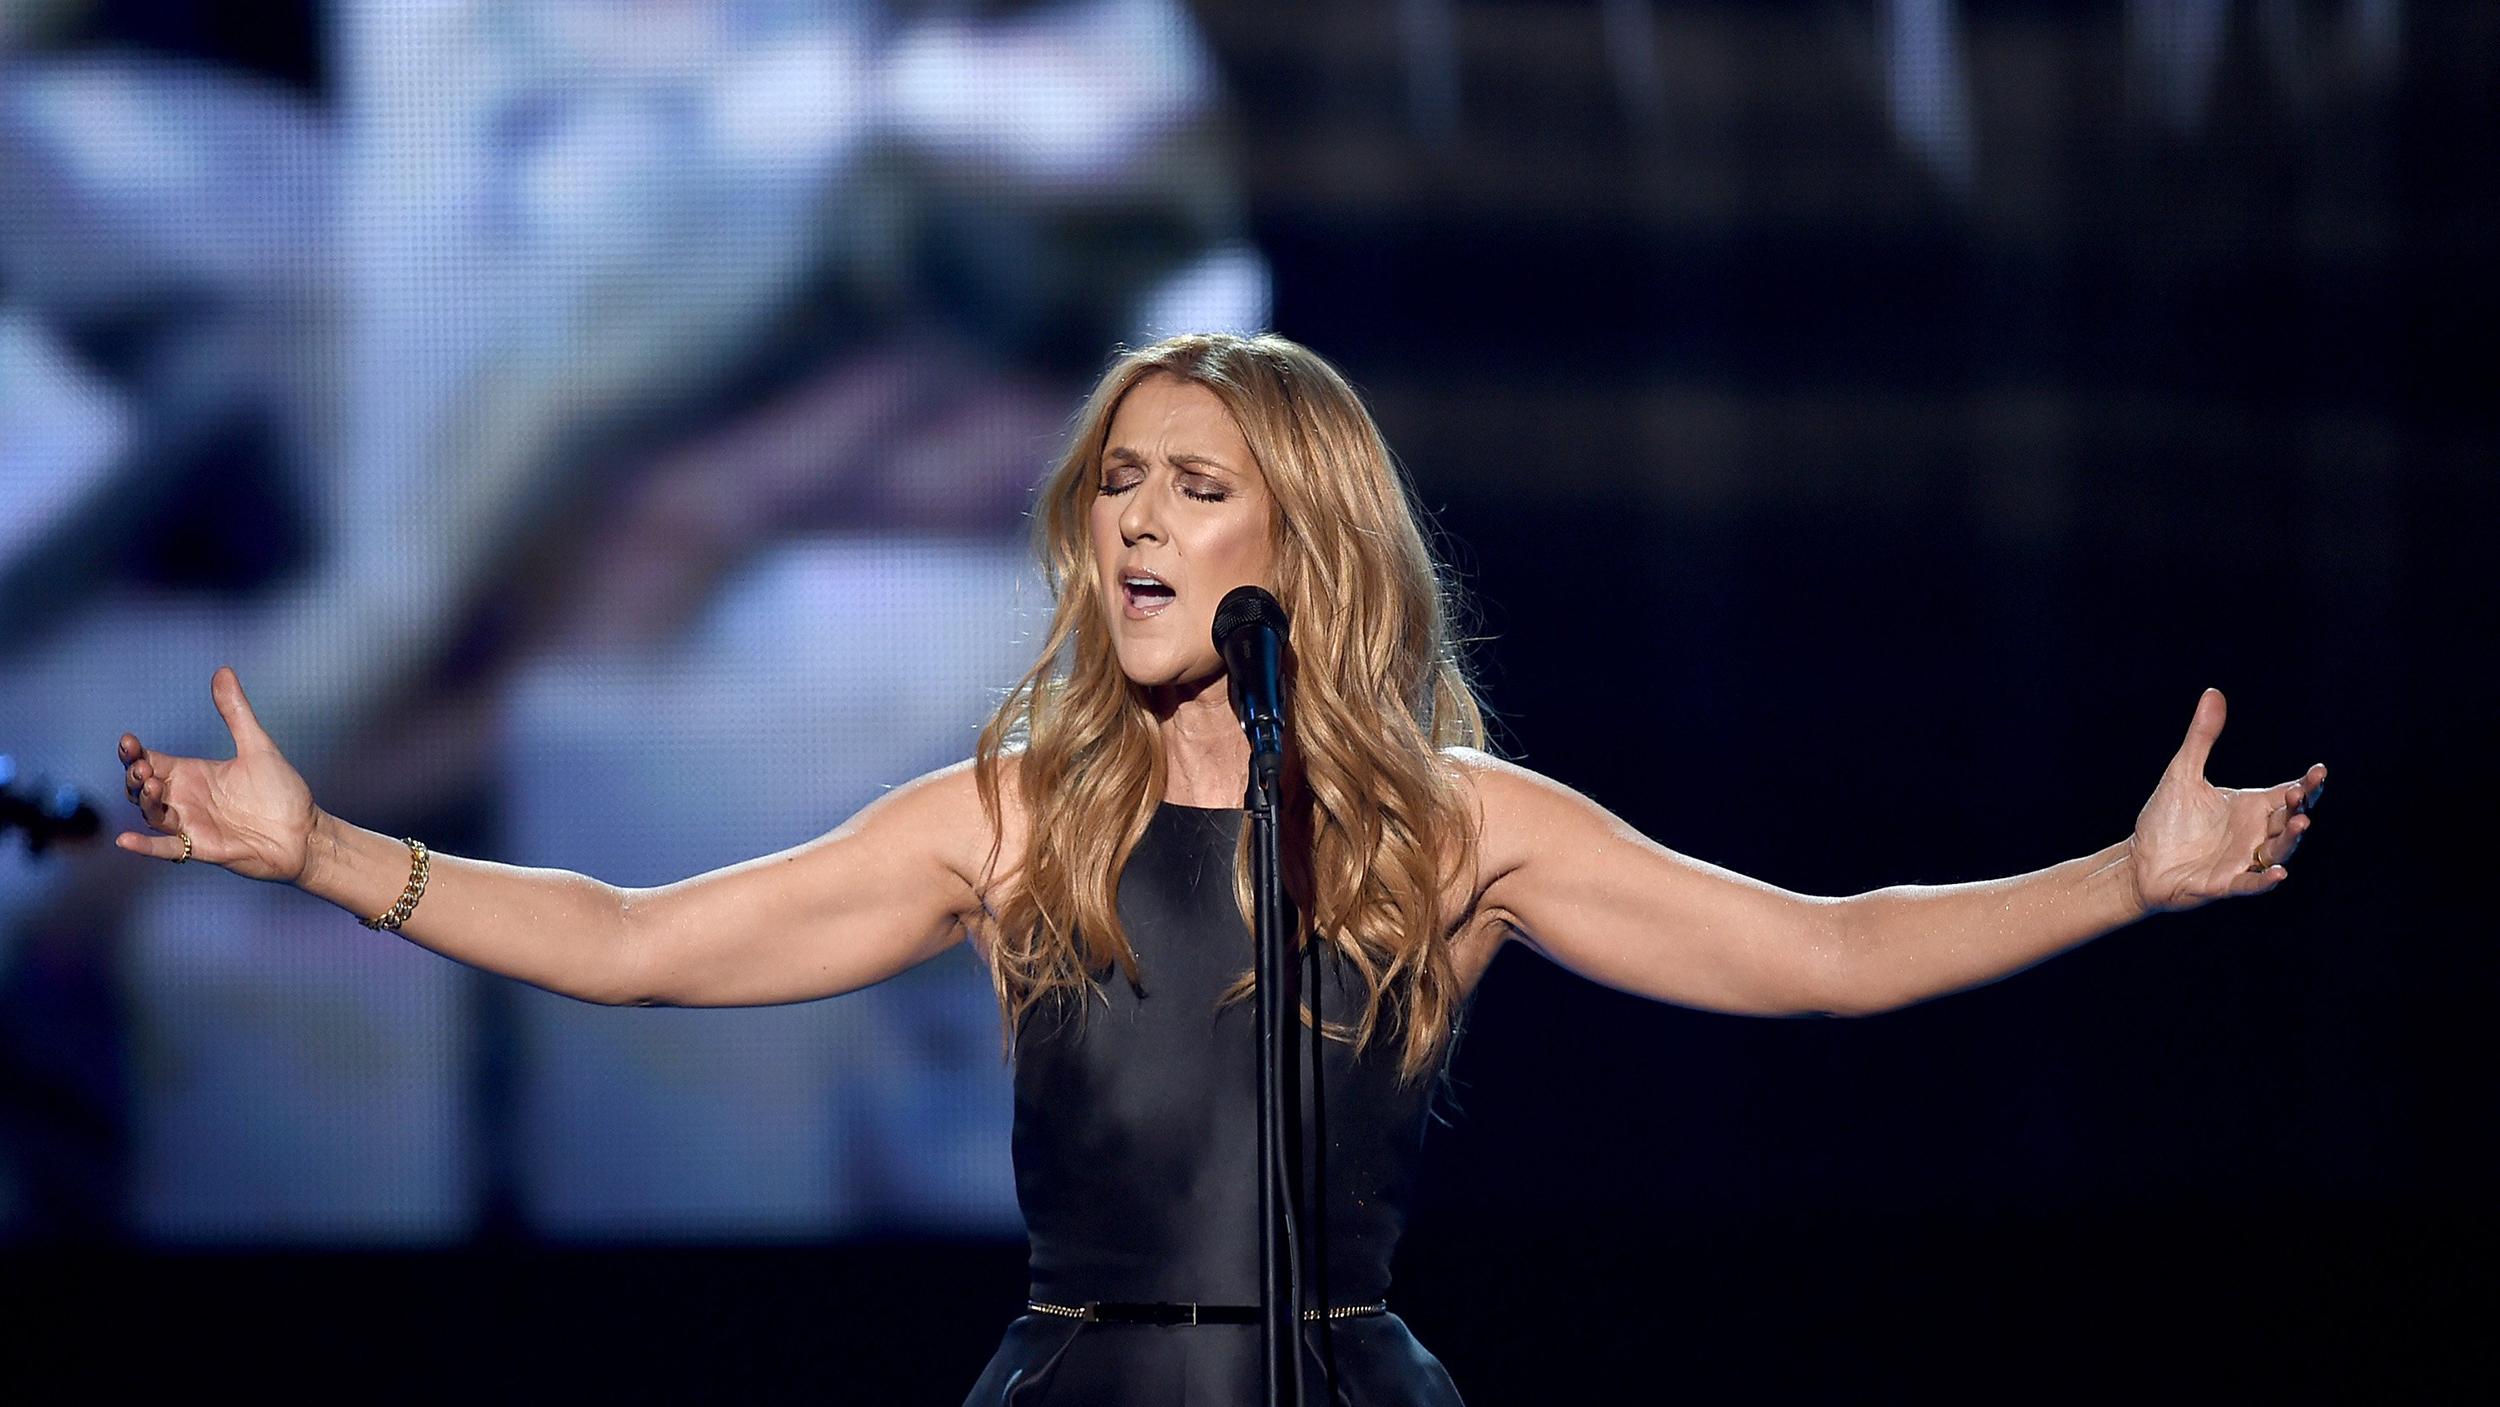 Your Light Celine Dion Celine Dion Today Inline Fbfedbffebce